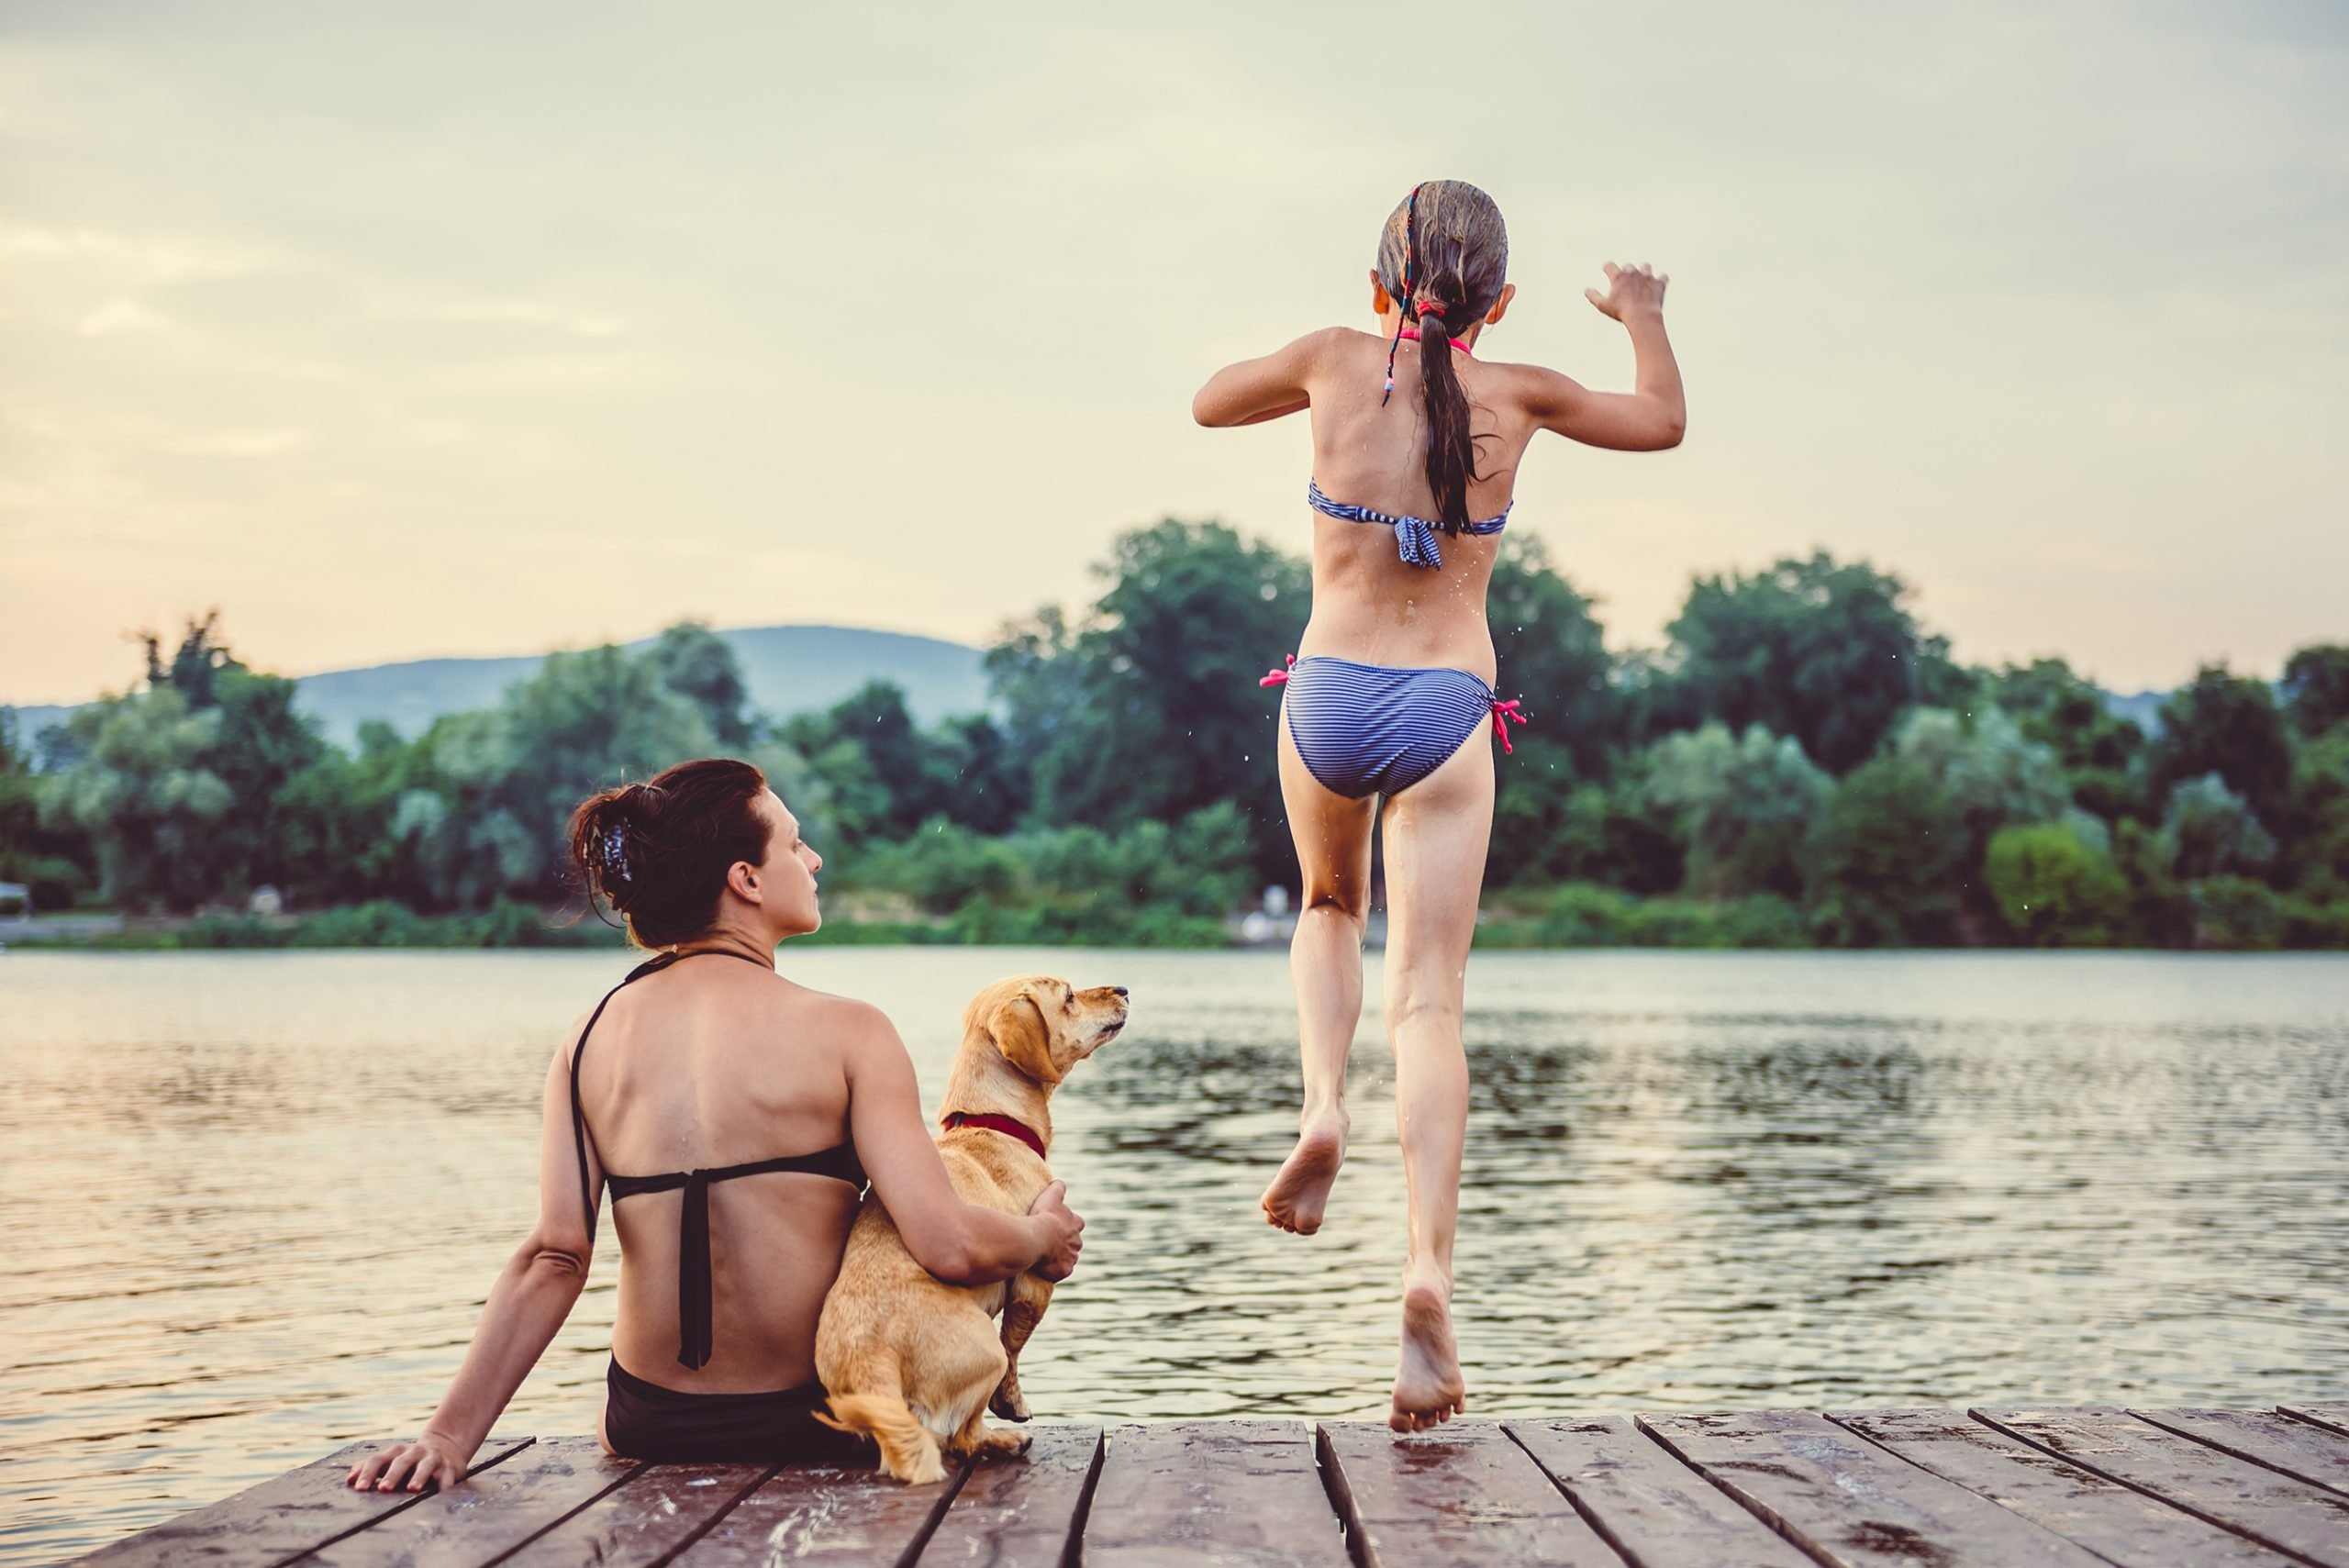 Jumpstart The Season With an Annual Wellness Check